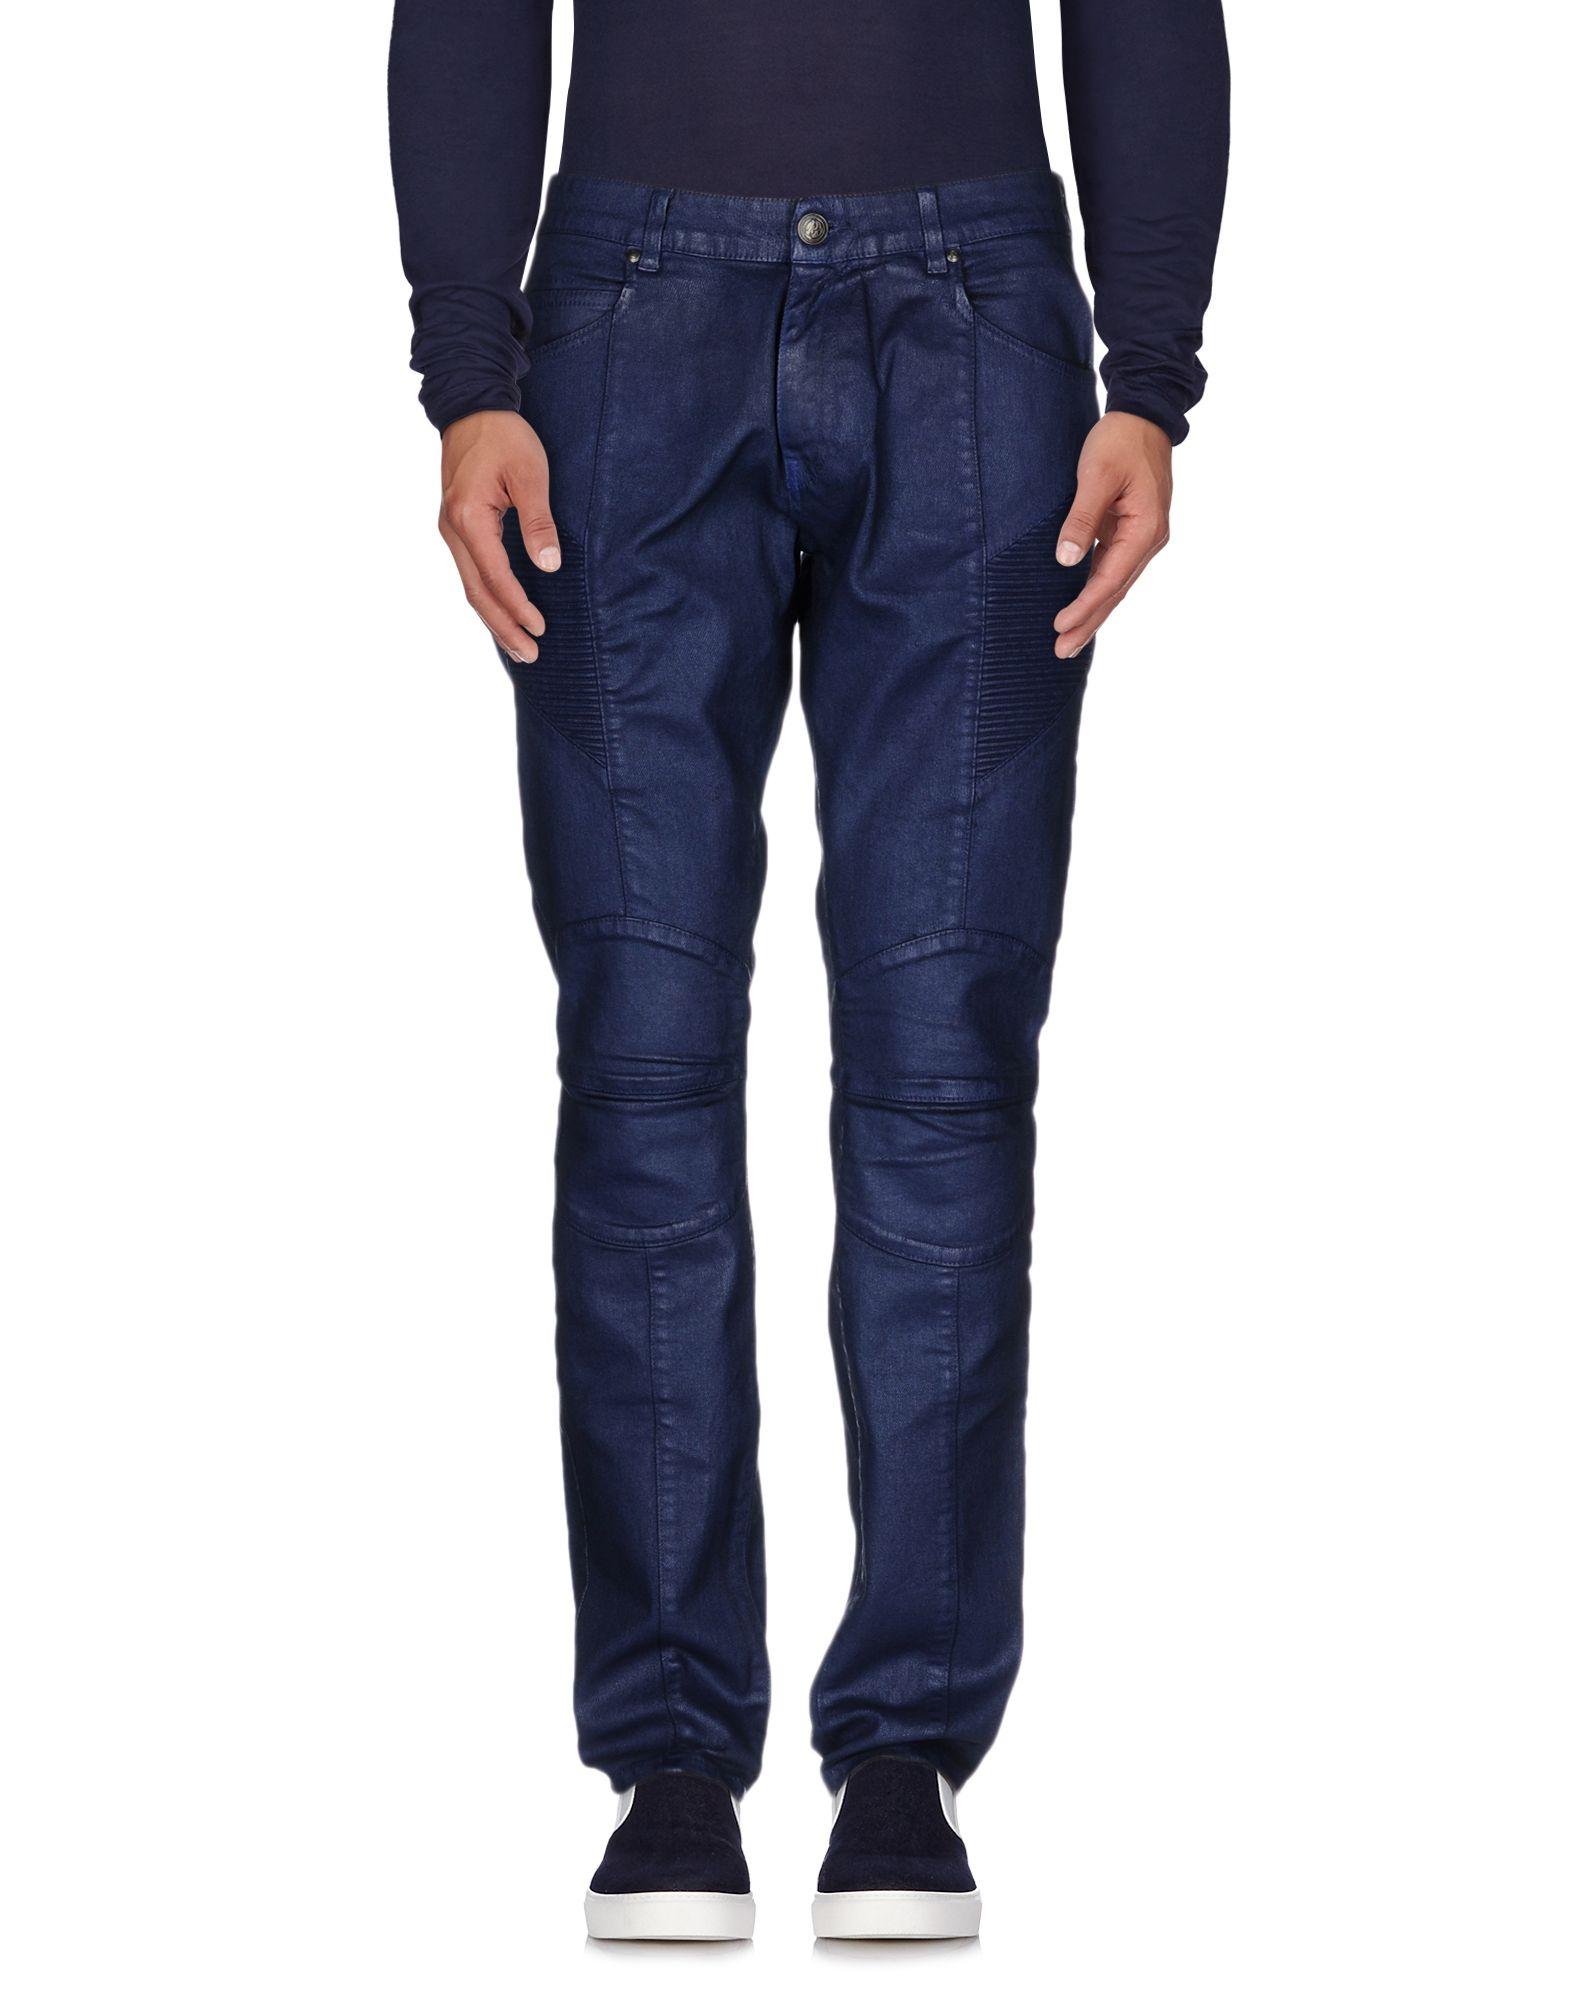 Pantaloni Jeans Pierre Balmain Balmain Balmain Uomo - 42504720TH af75fb